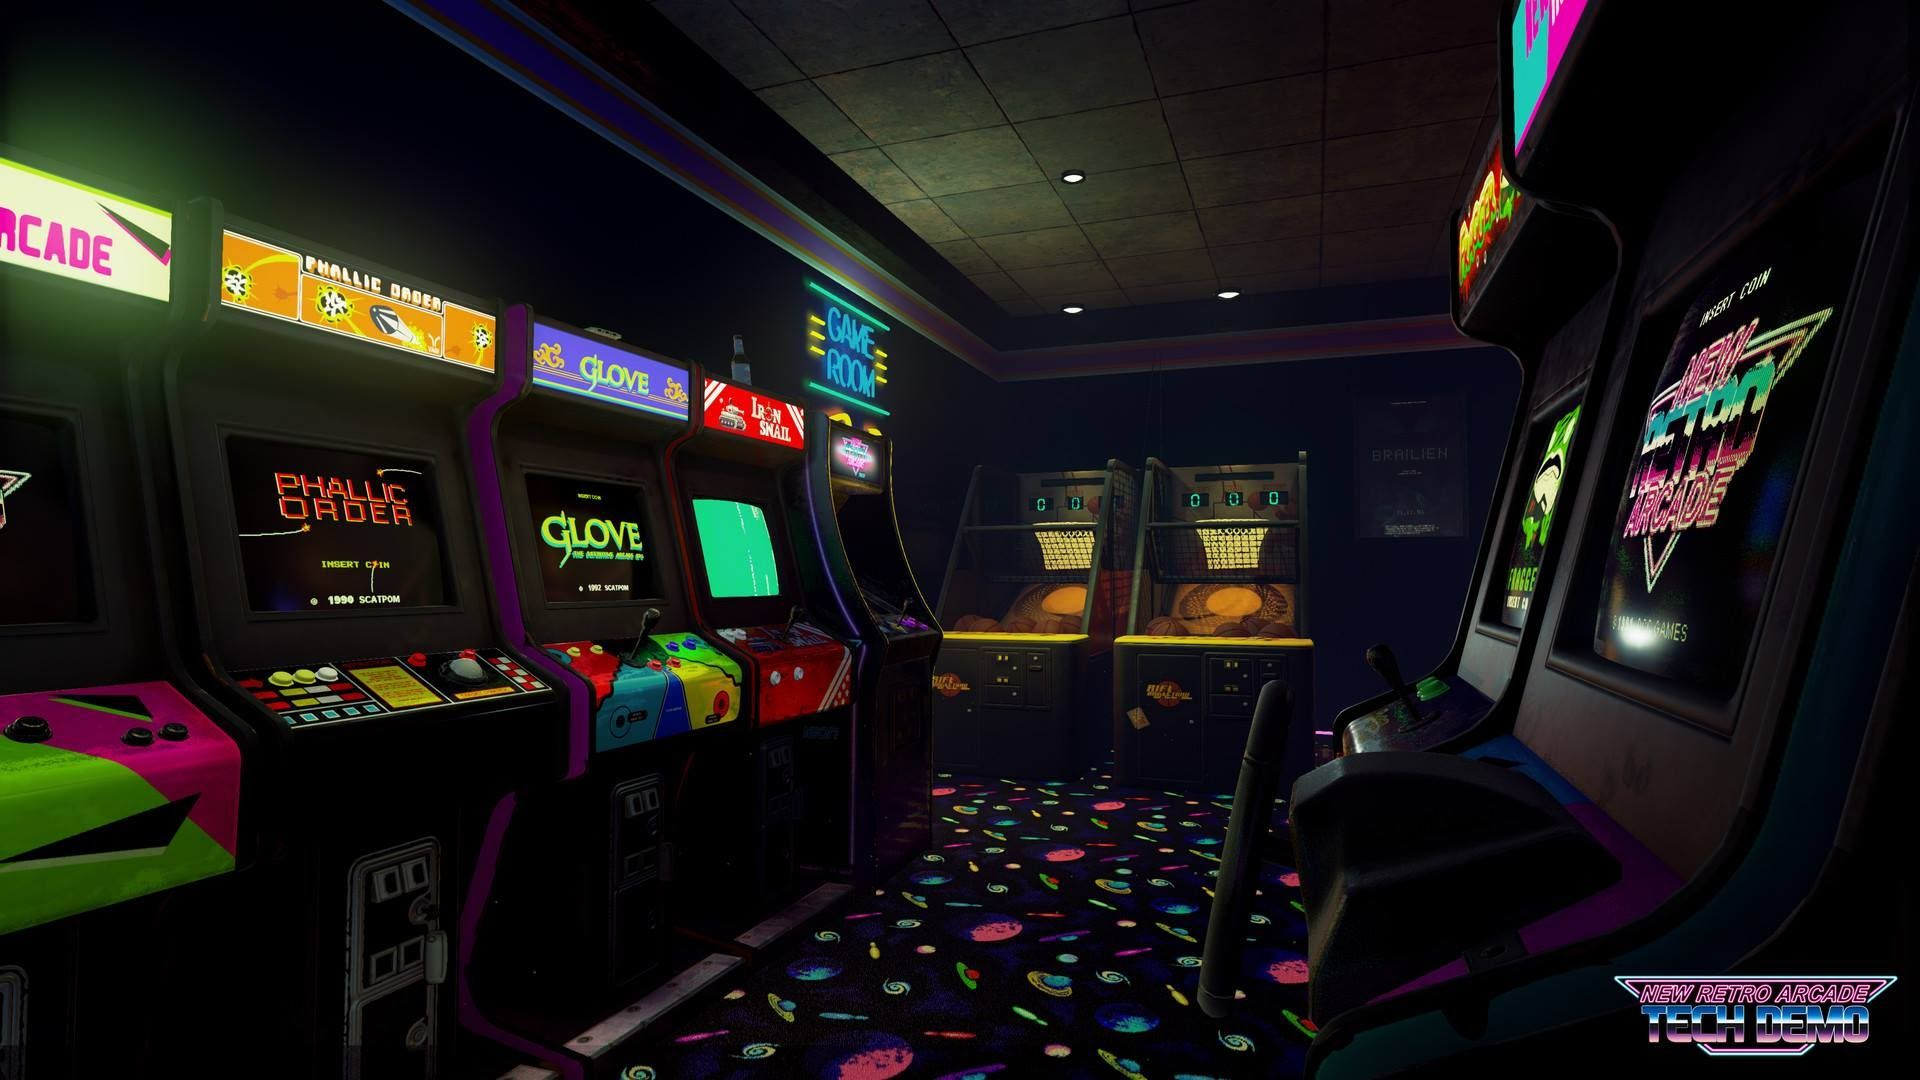 New Retro Arcade Tech Demo Htc Vive Gameplay Retro Arcade Arcade Retro Games Wallpaper